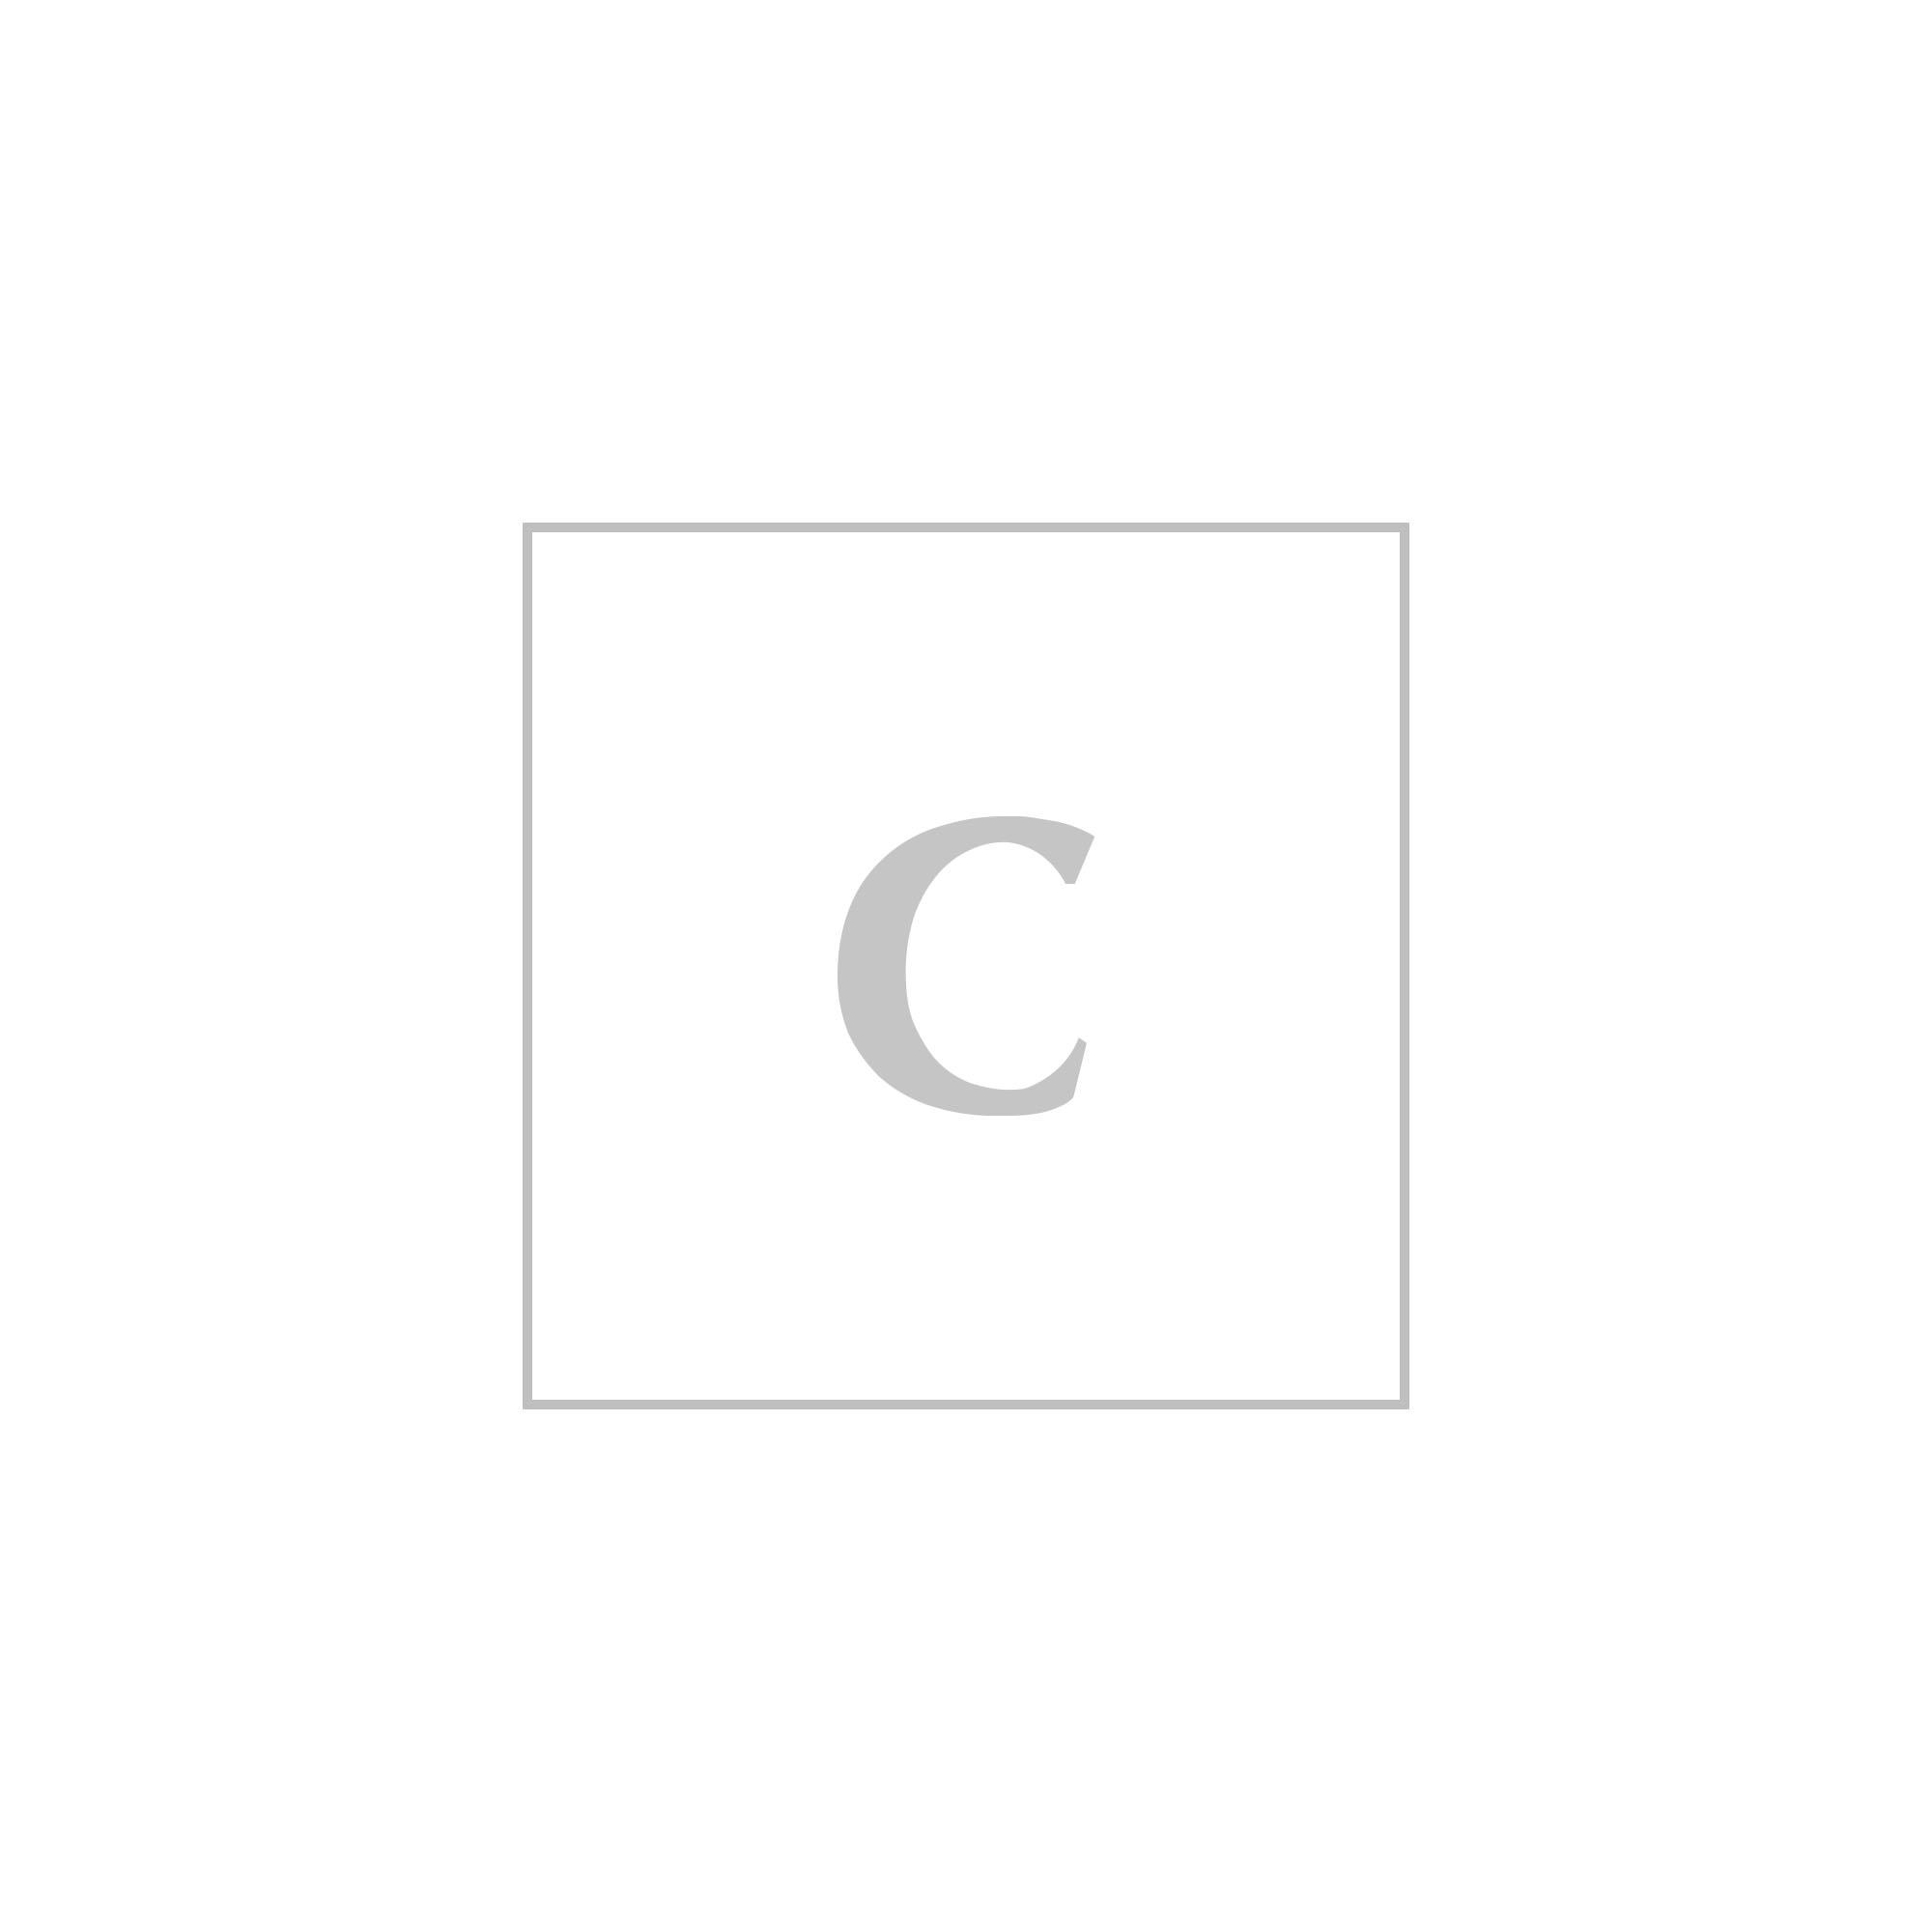 https://www.coltortiboutique.com/media/catalog/product/cache/926507dc7f93631a094422215b778fe0/s/k/skirts_miu-miu_blu_192151dgn000002-f0013-7.jpg